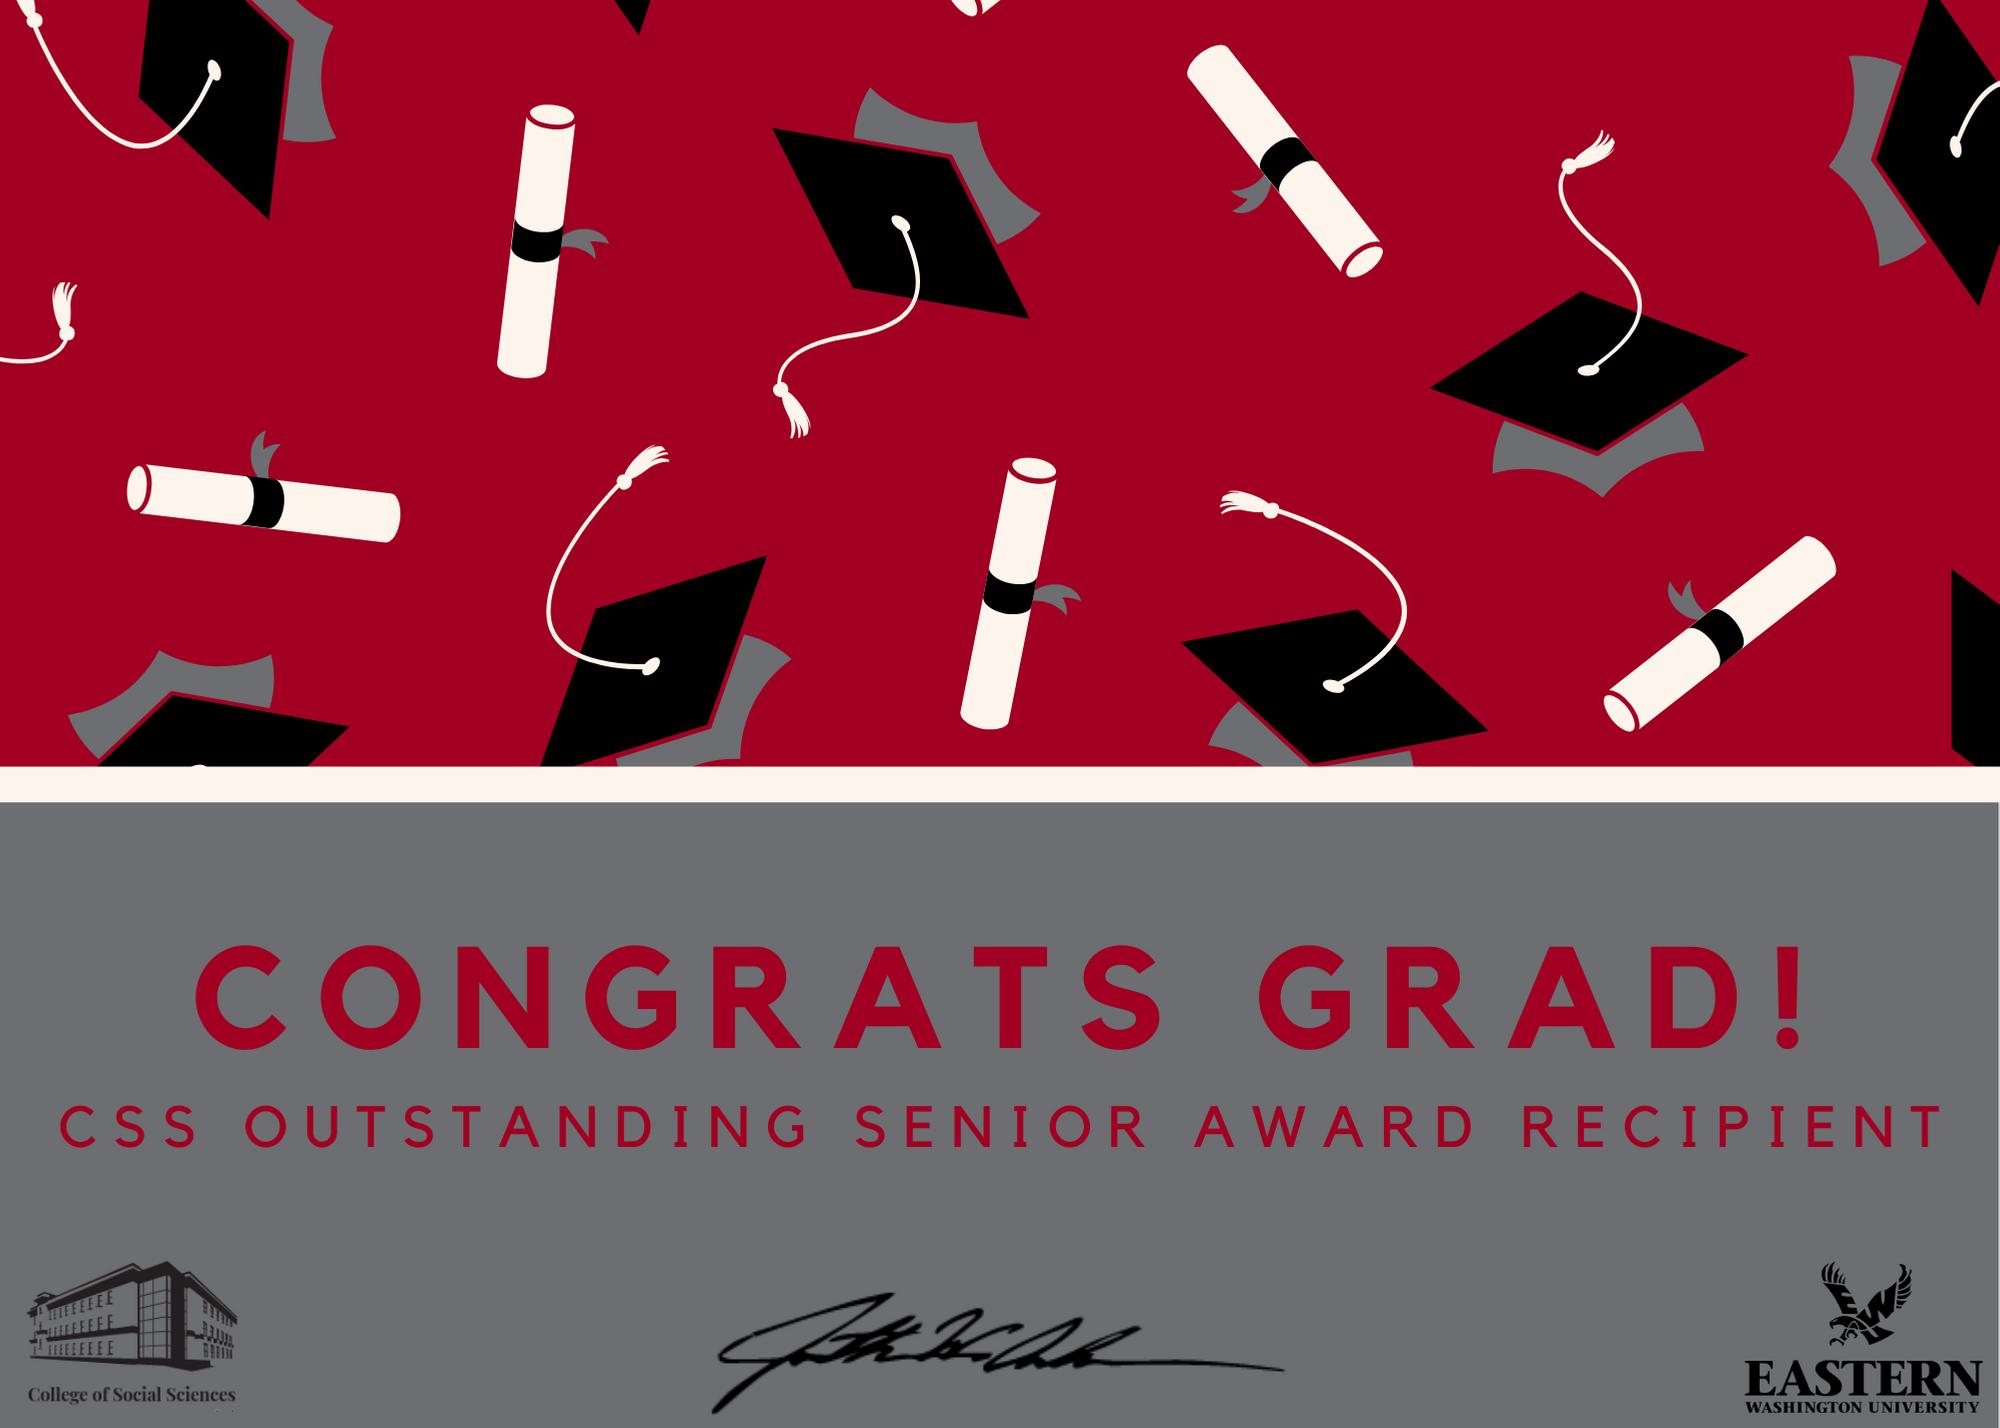 4145-caps-and-diplomas-pattern-graduation-card-2.png